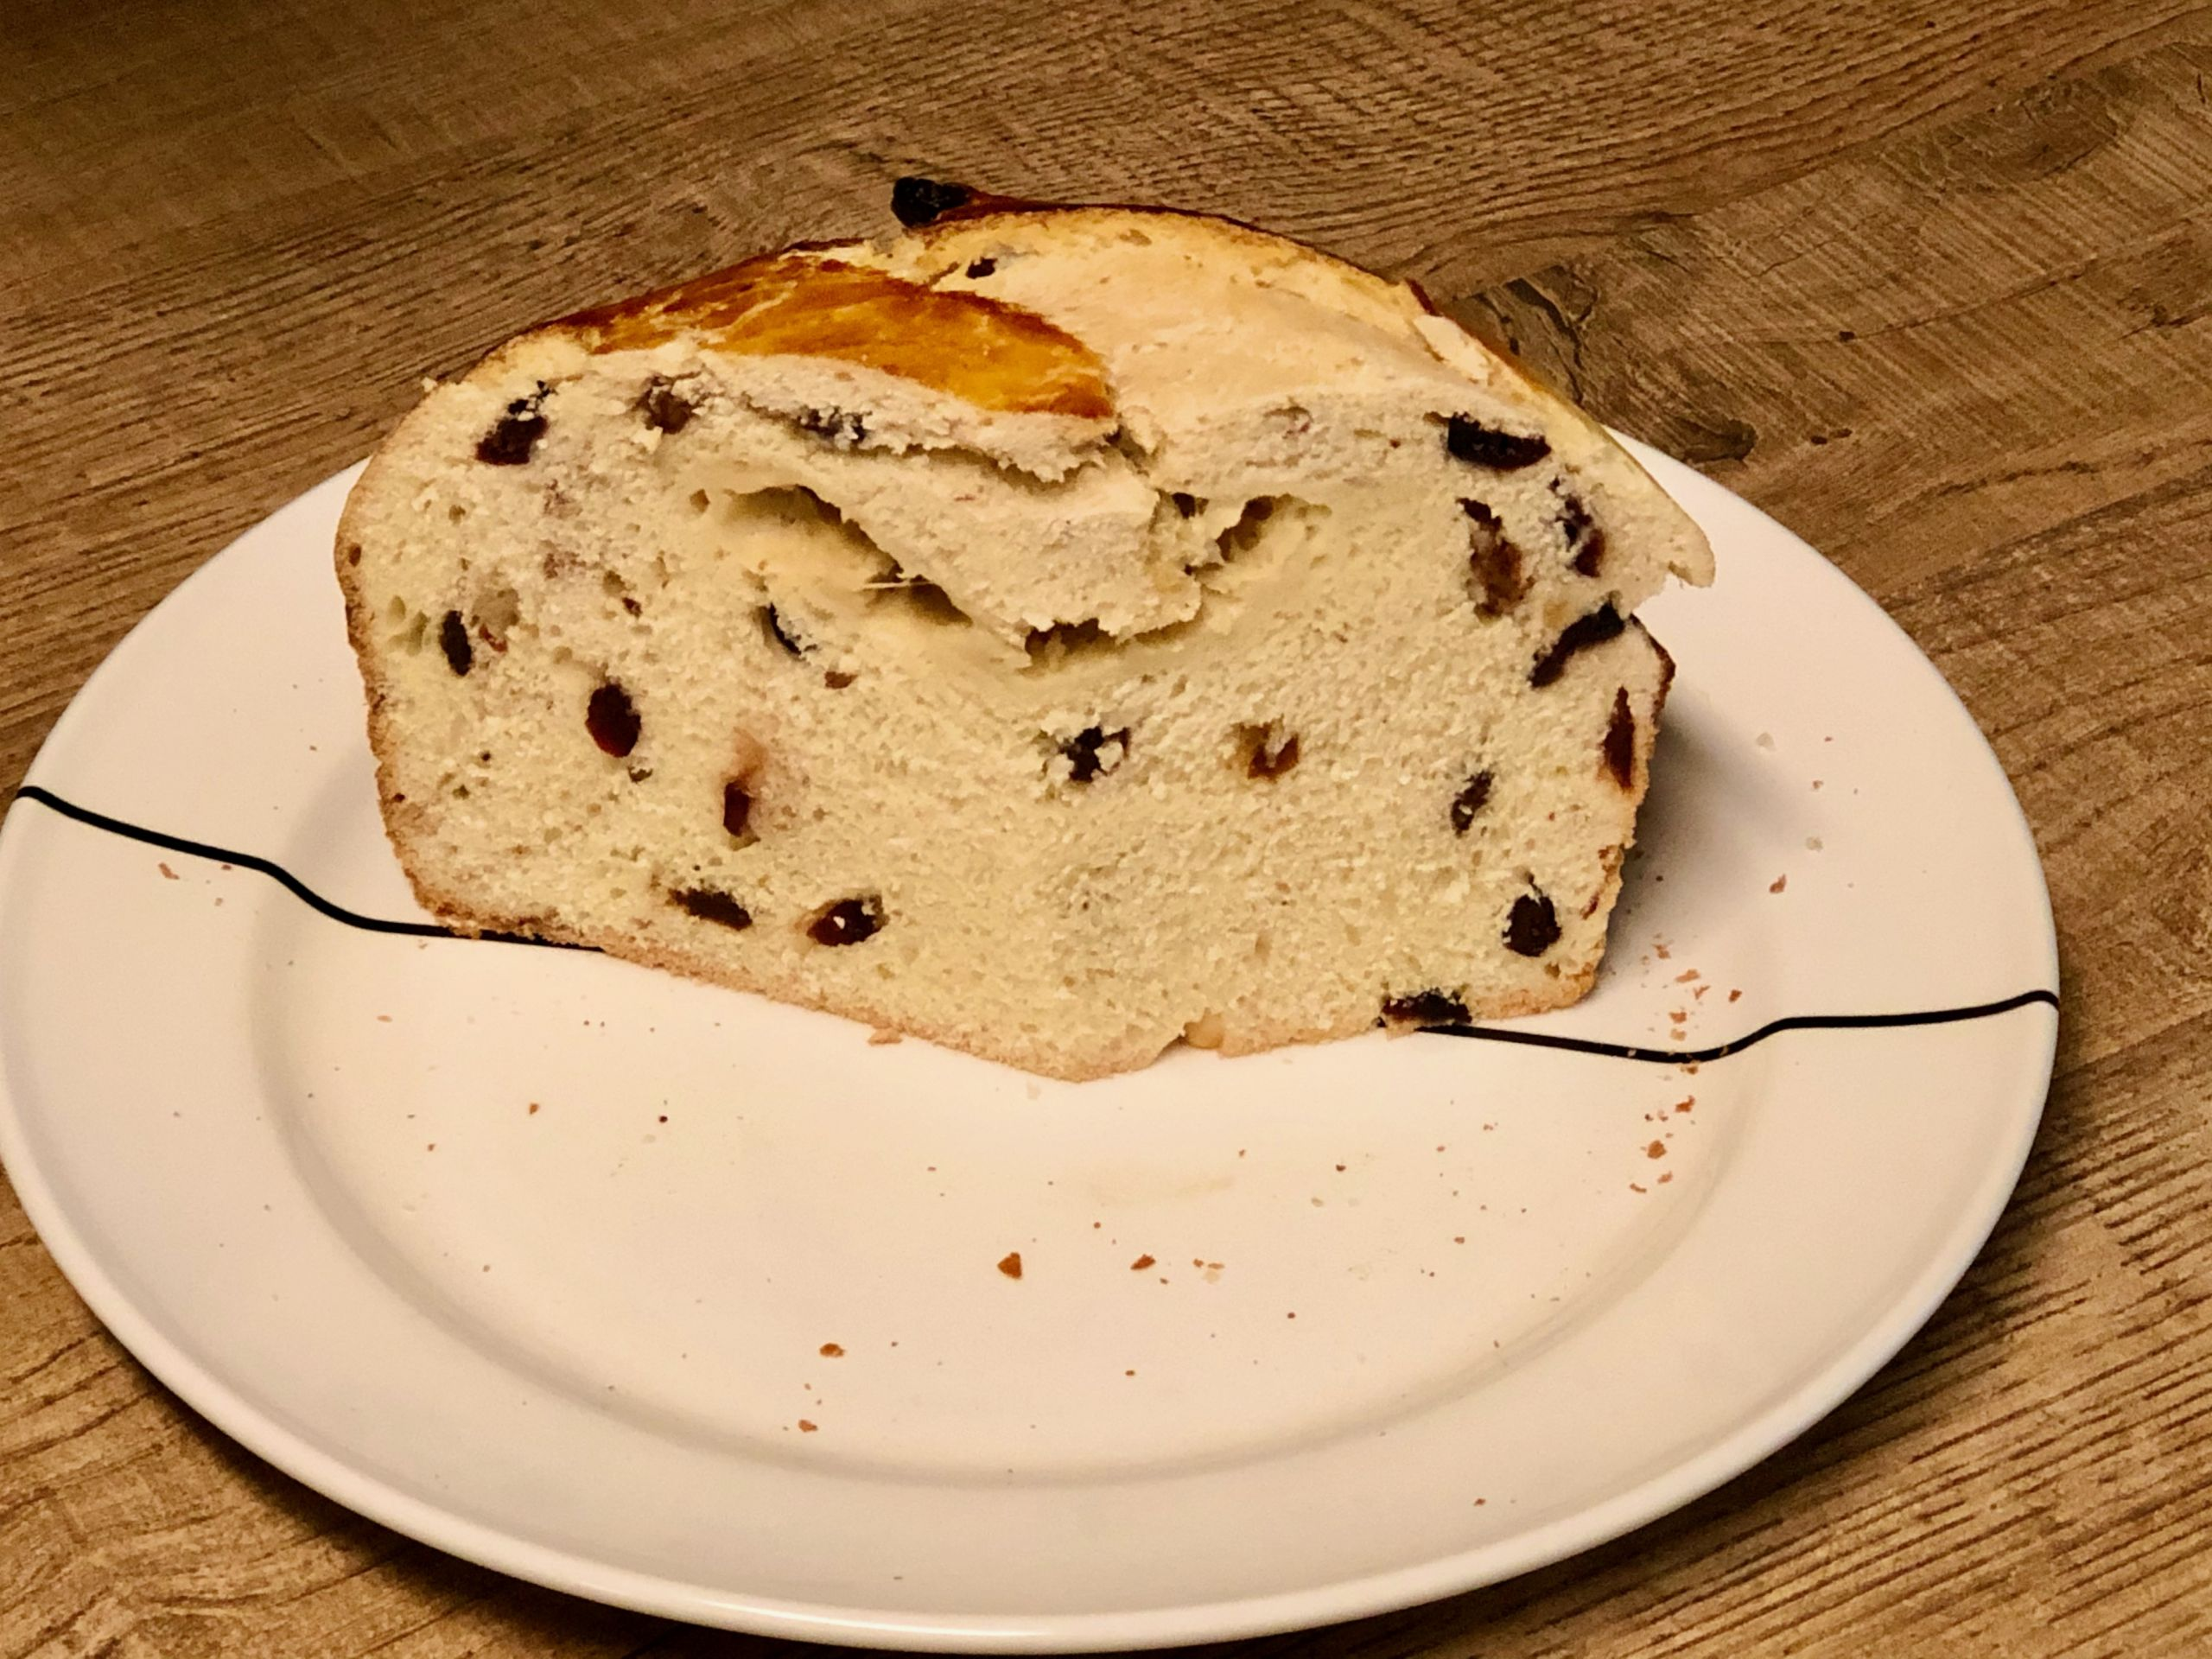 Slovak Easter Bread  Paska Slovak Easter bread – surprisingcipes